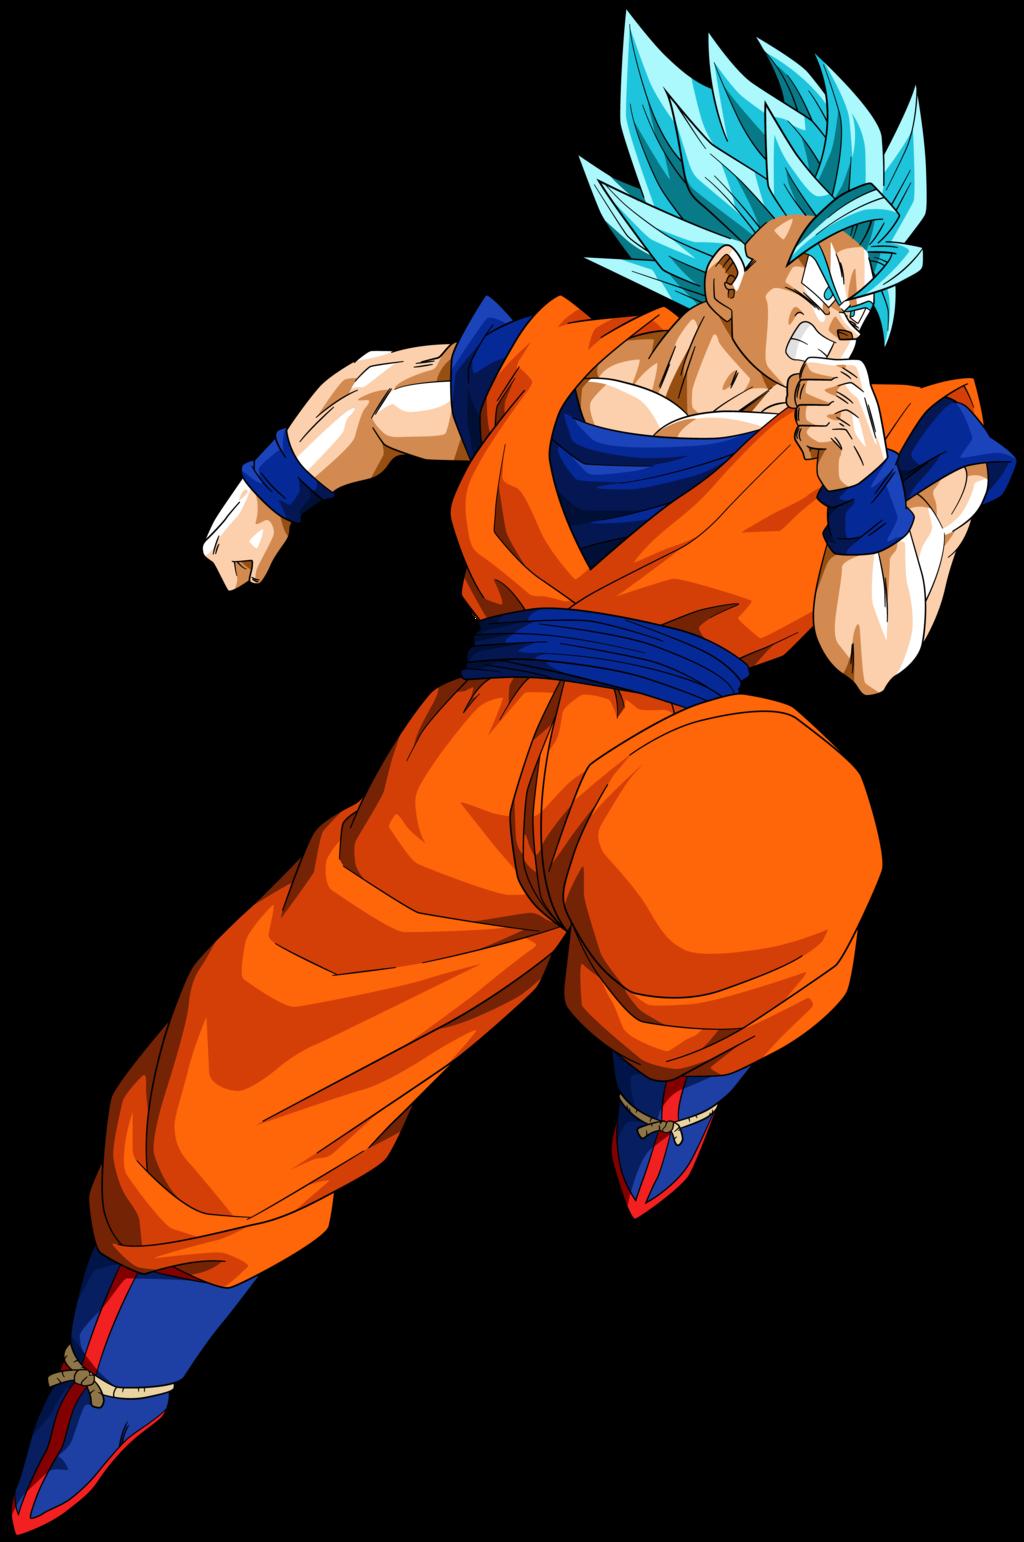 Image - Ssgss goku render.png | Dragon Ball Wiki | Fandom ...